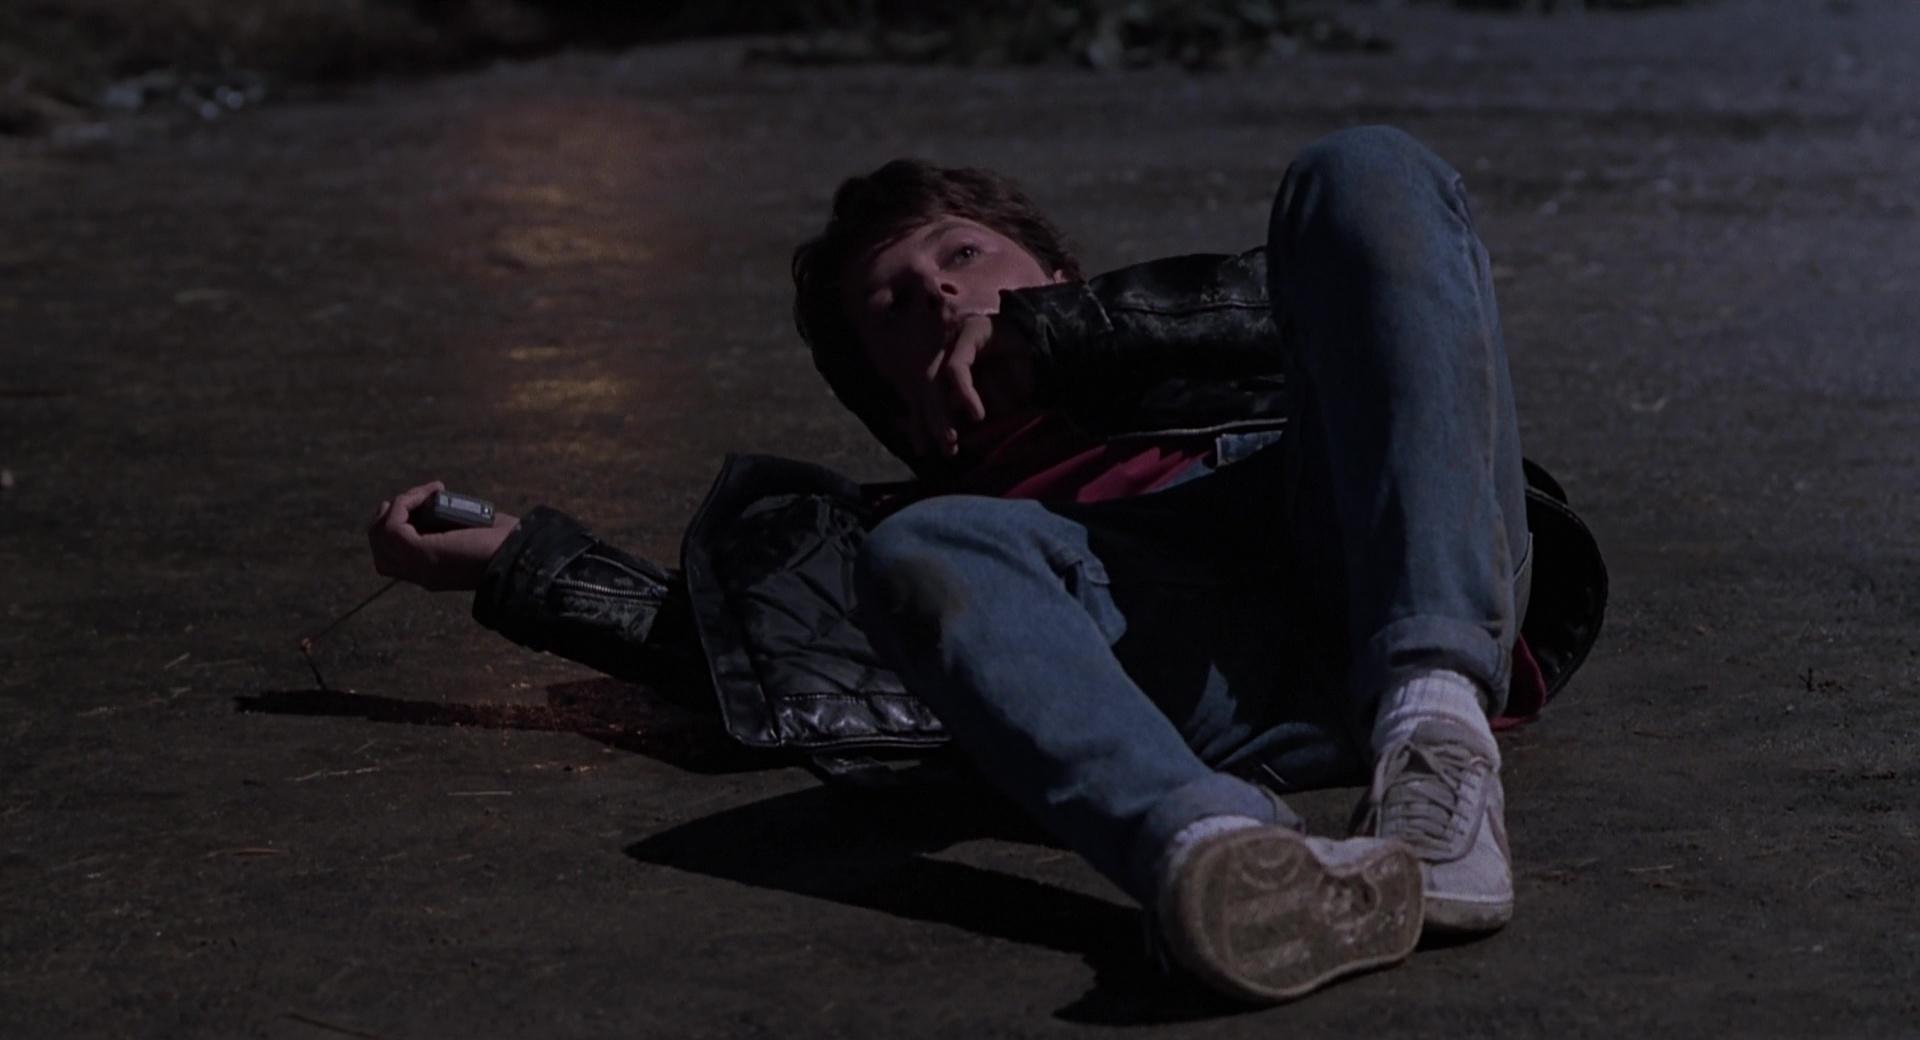 Nike Sneakers Worn By Michael J Fox Marty Mcfly In Back